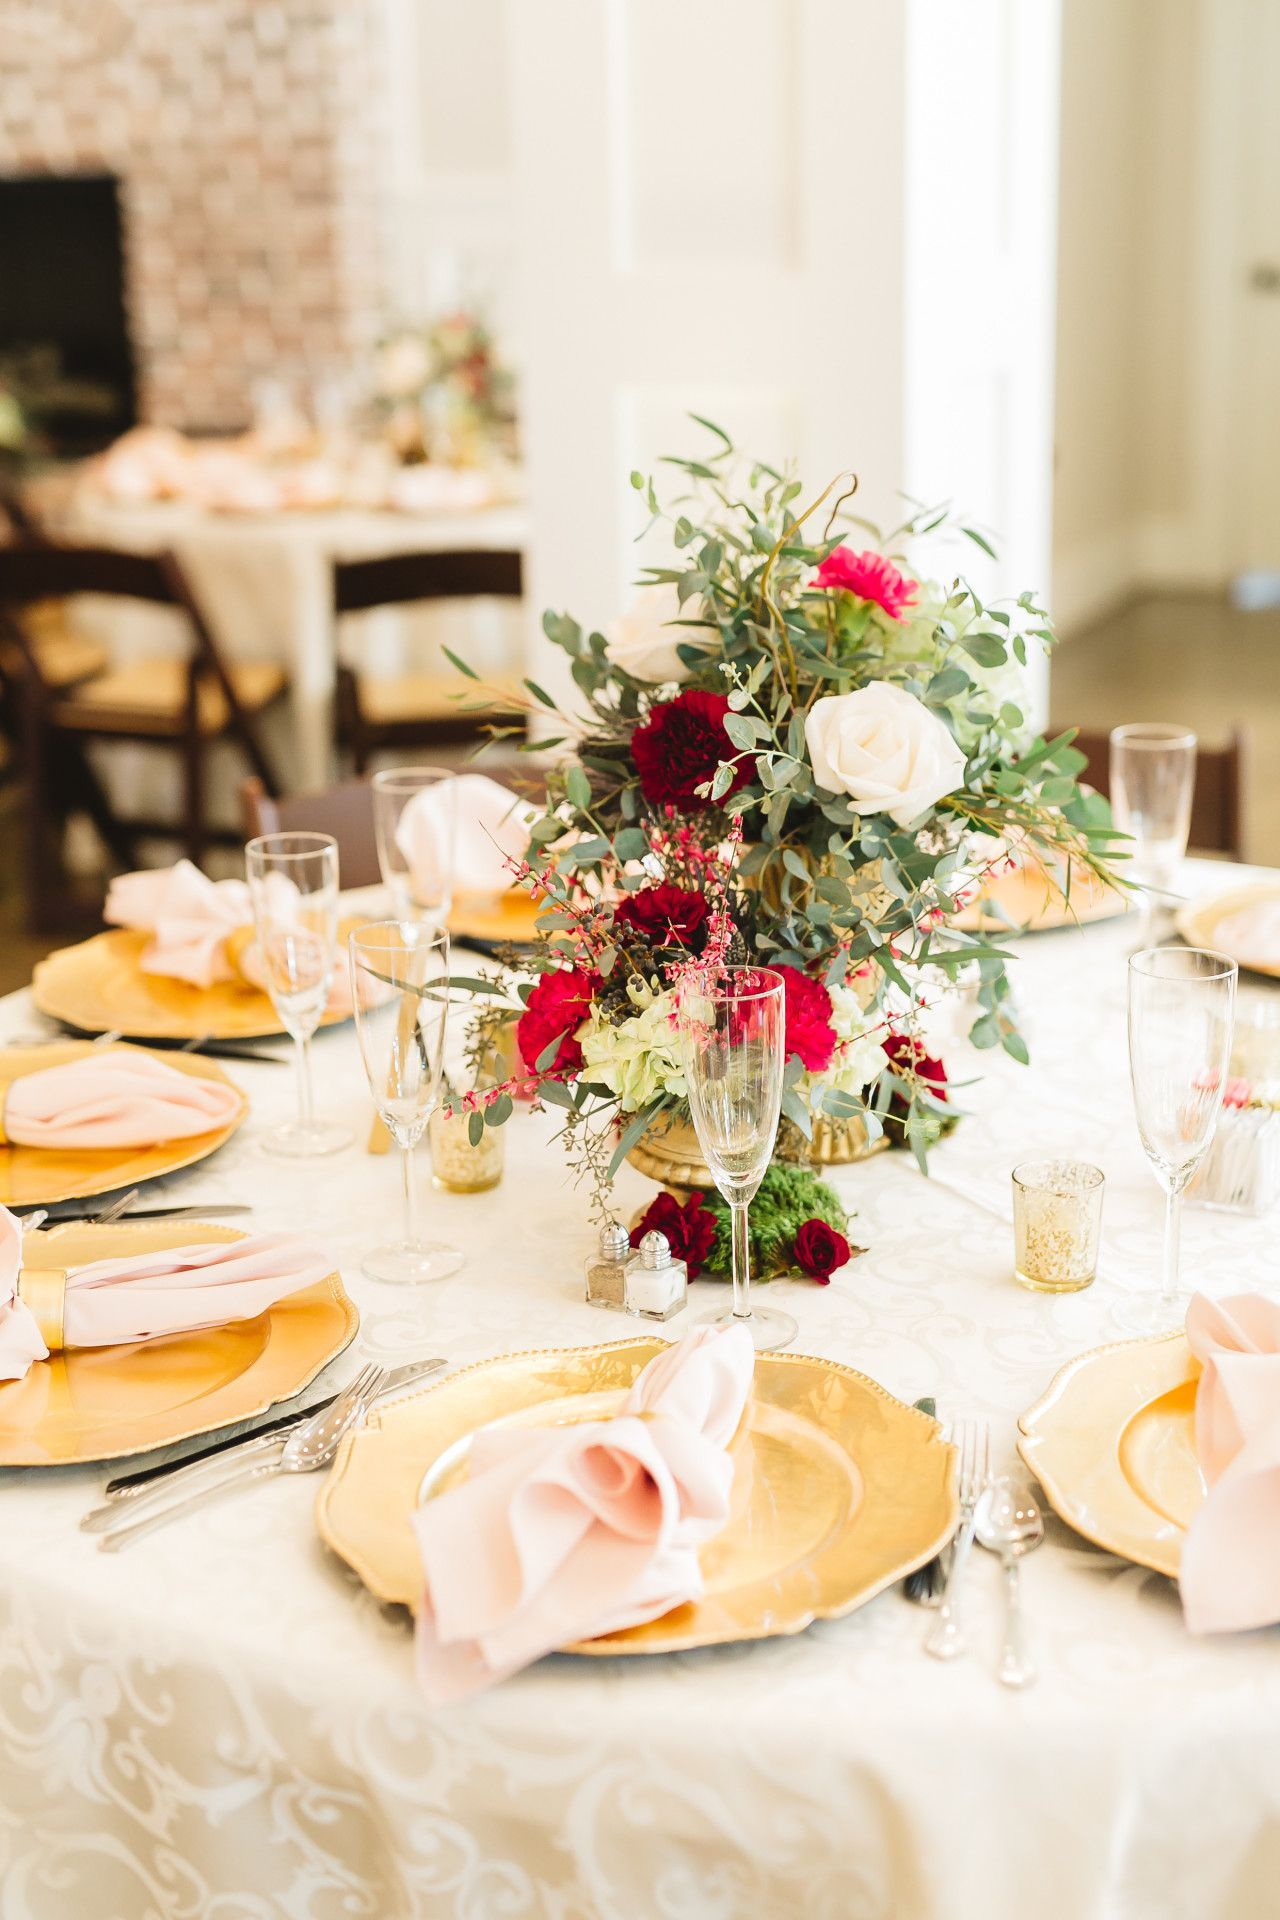 Magnolia Manor Pastel Wedding Wedding Table Layouts Pastel Wedding Flowers